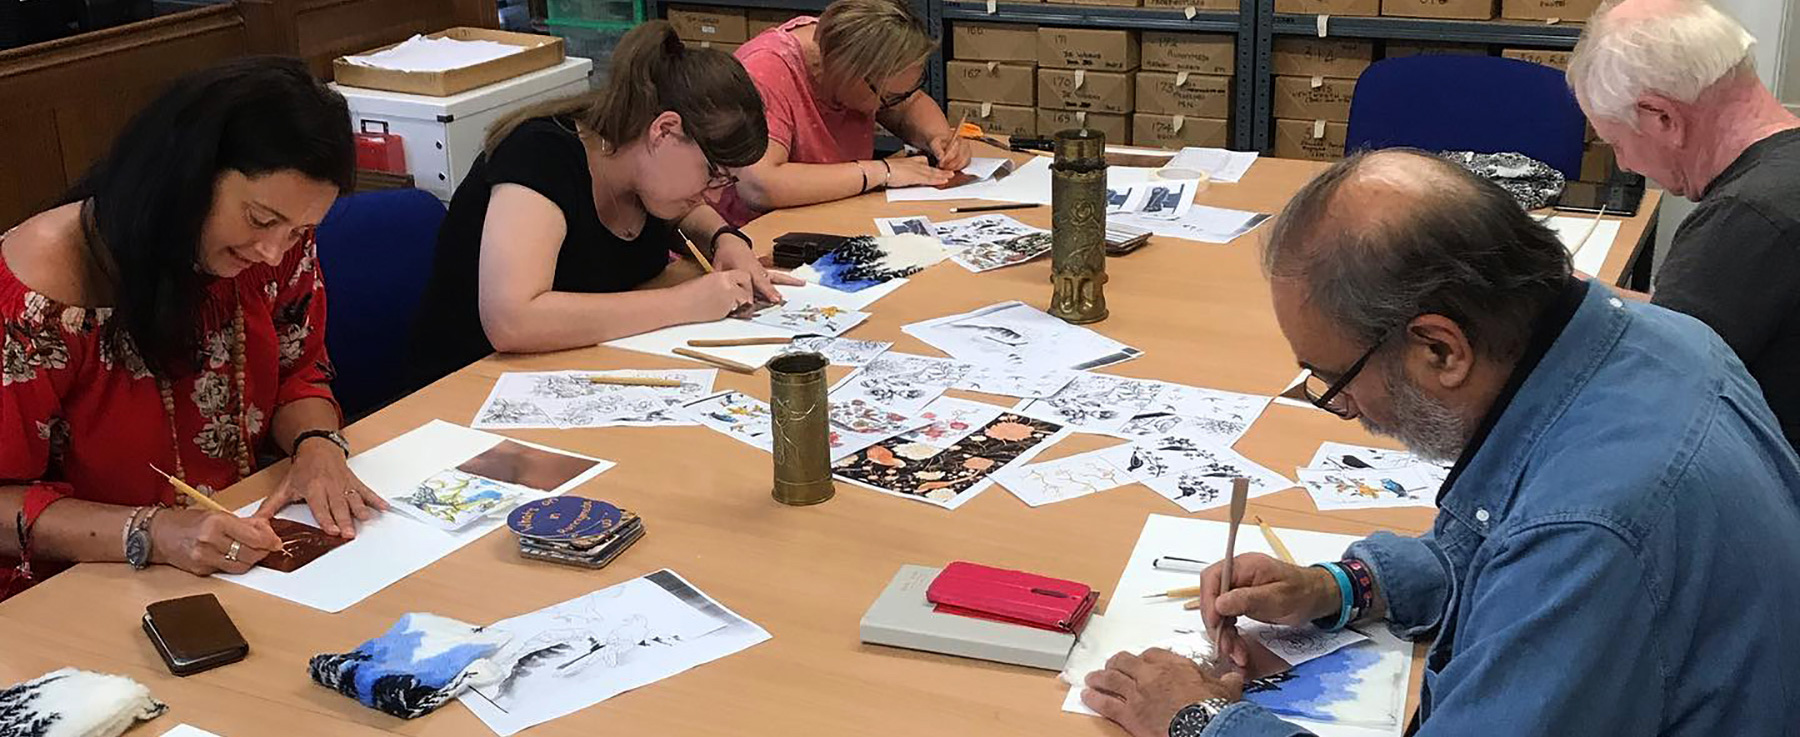 Art Workshops from Steve Glynn at Art for Everyone